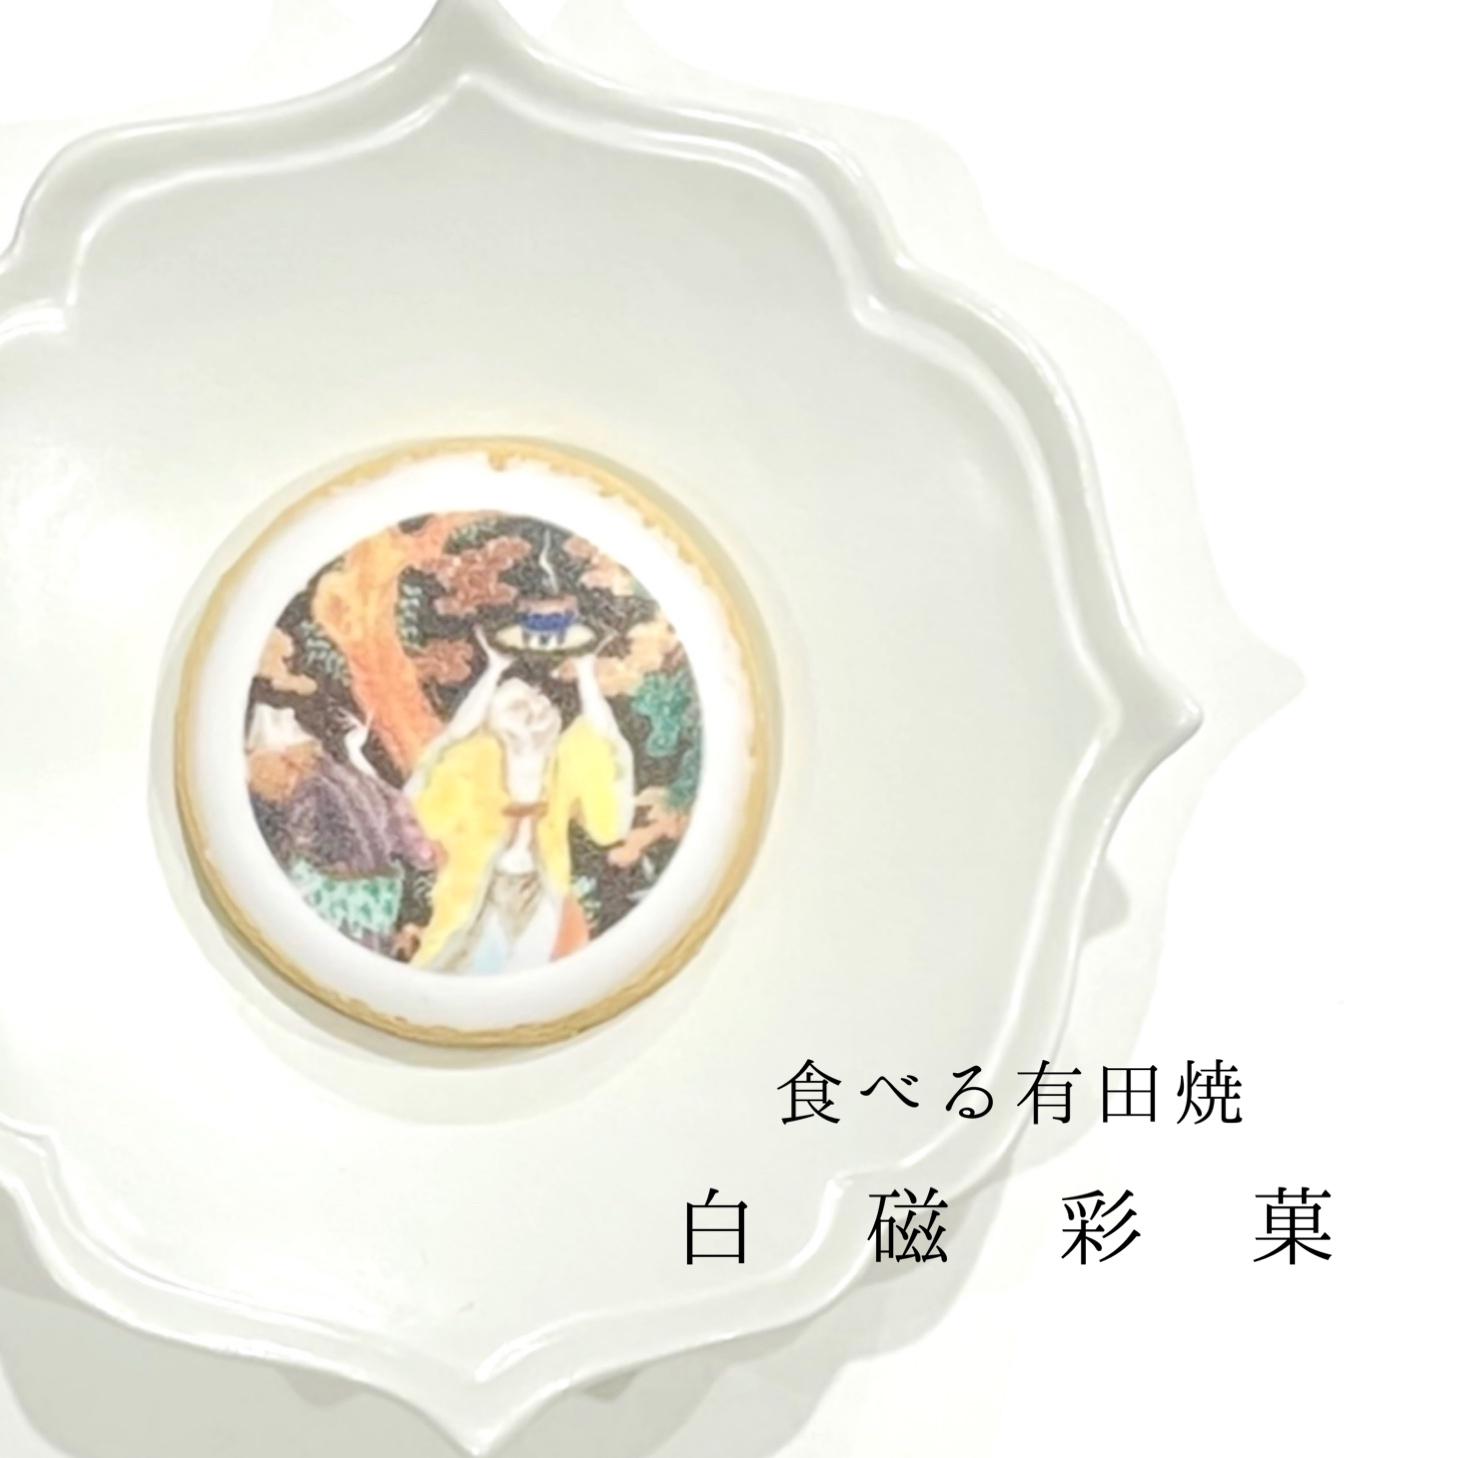 食べる有田焼【白磁彩菓】